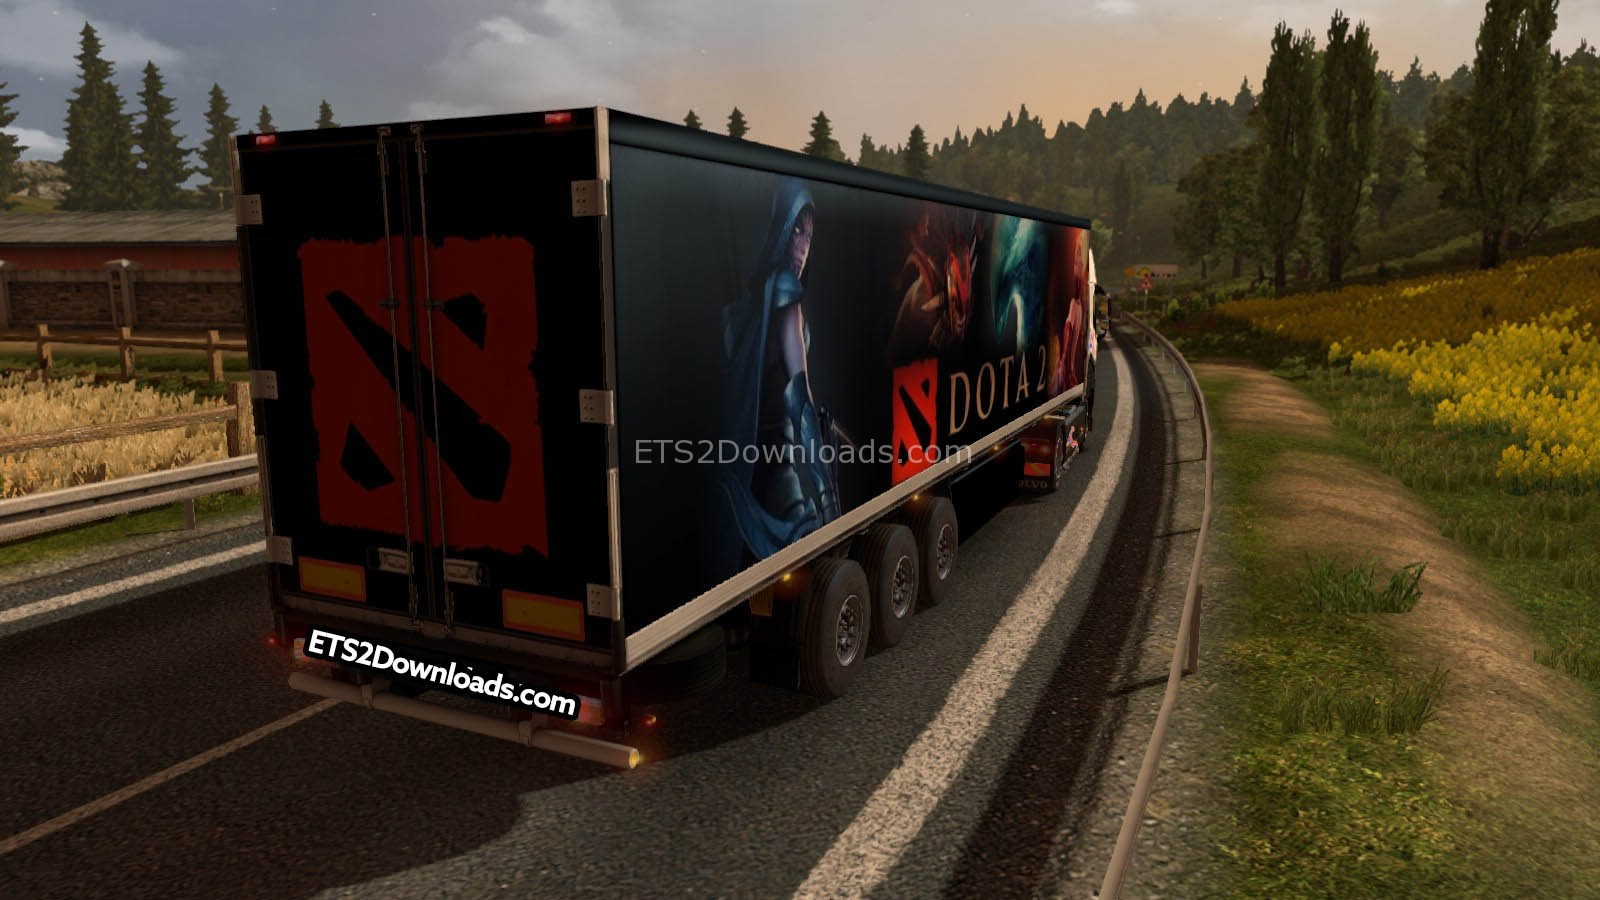 dota-2-trailer-2